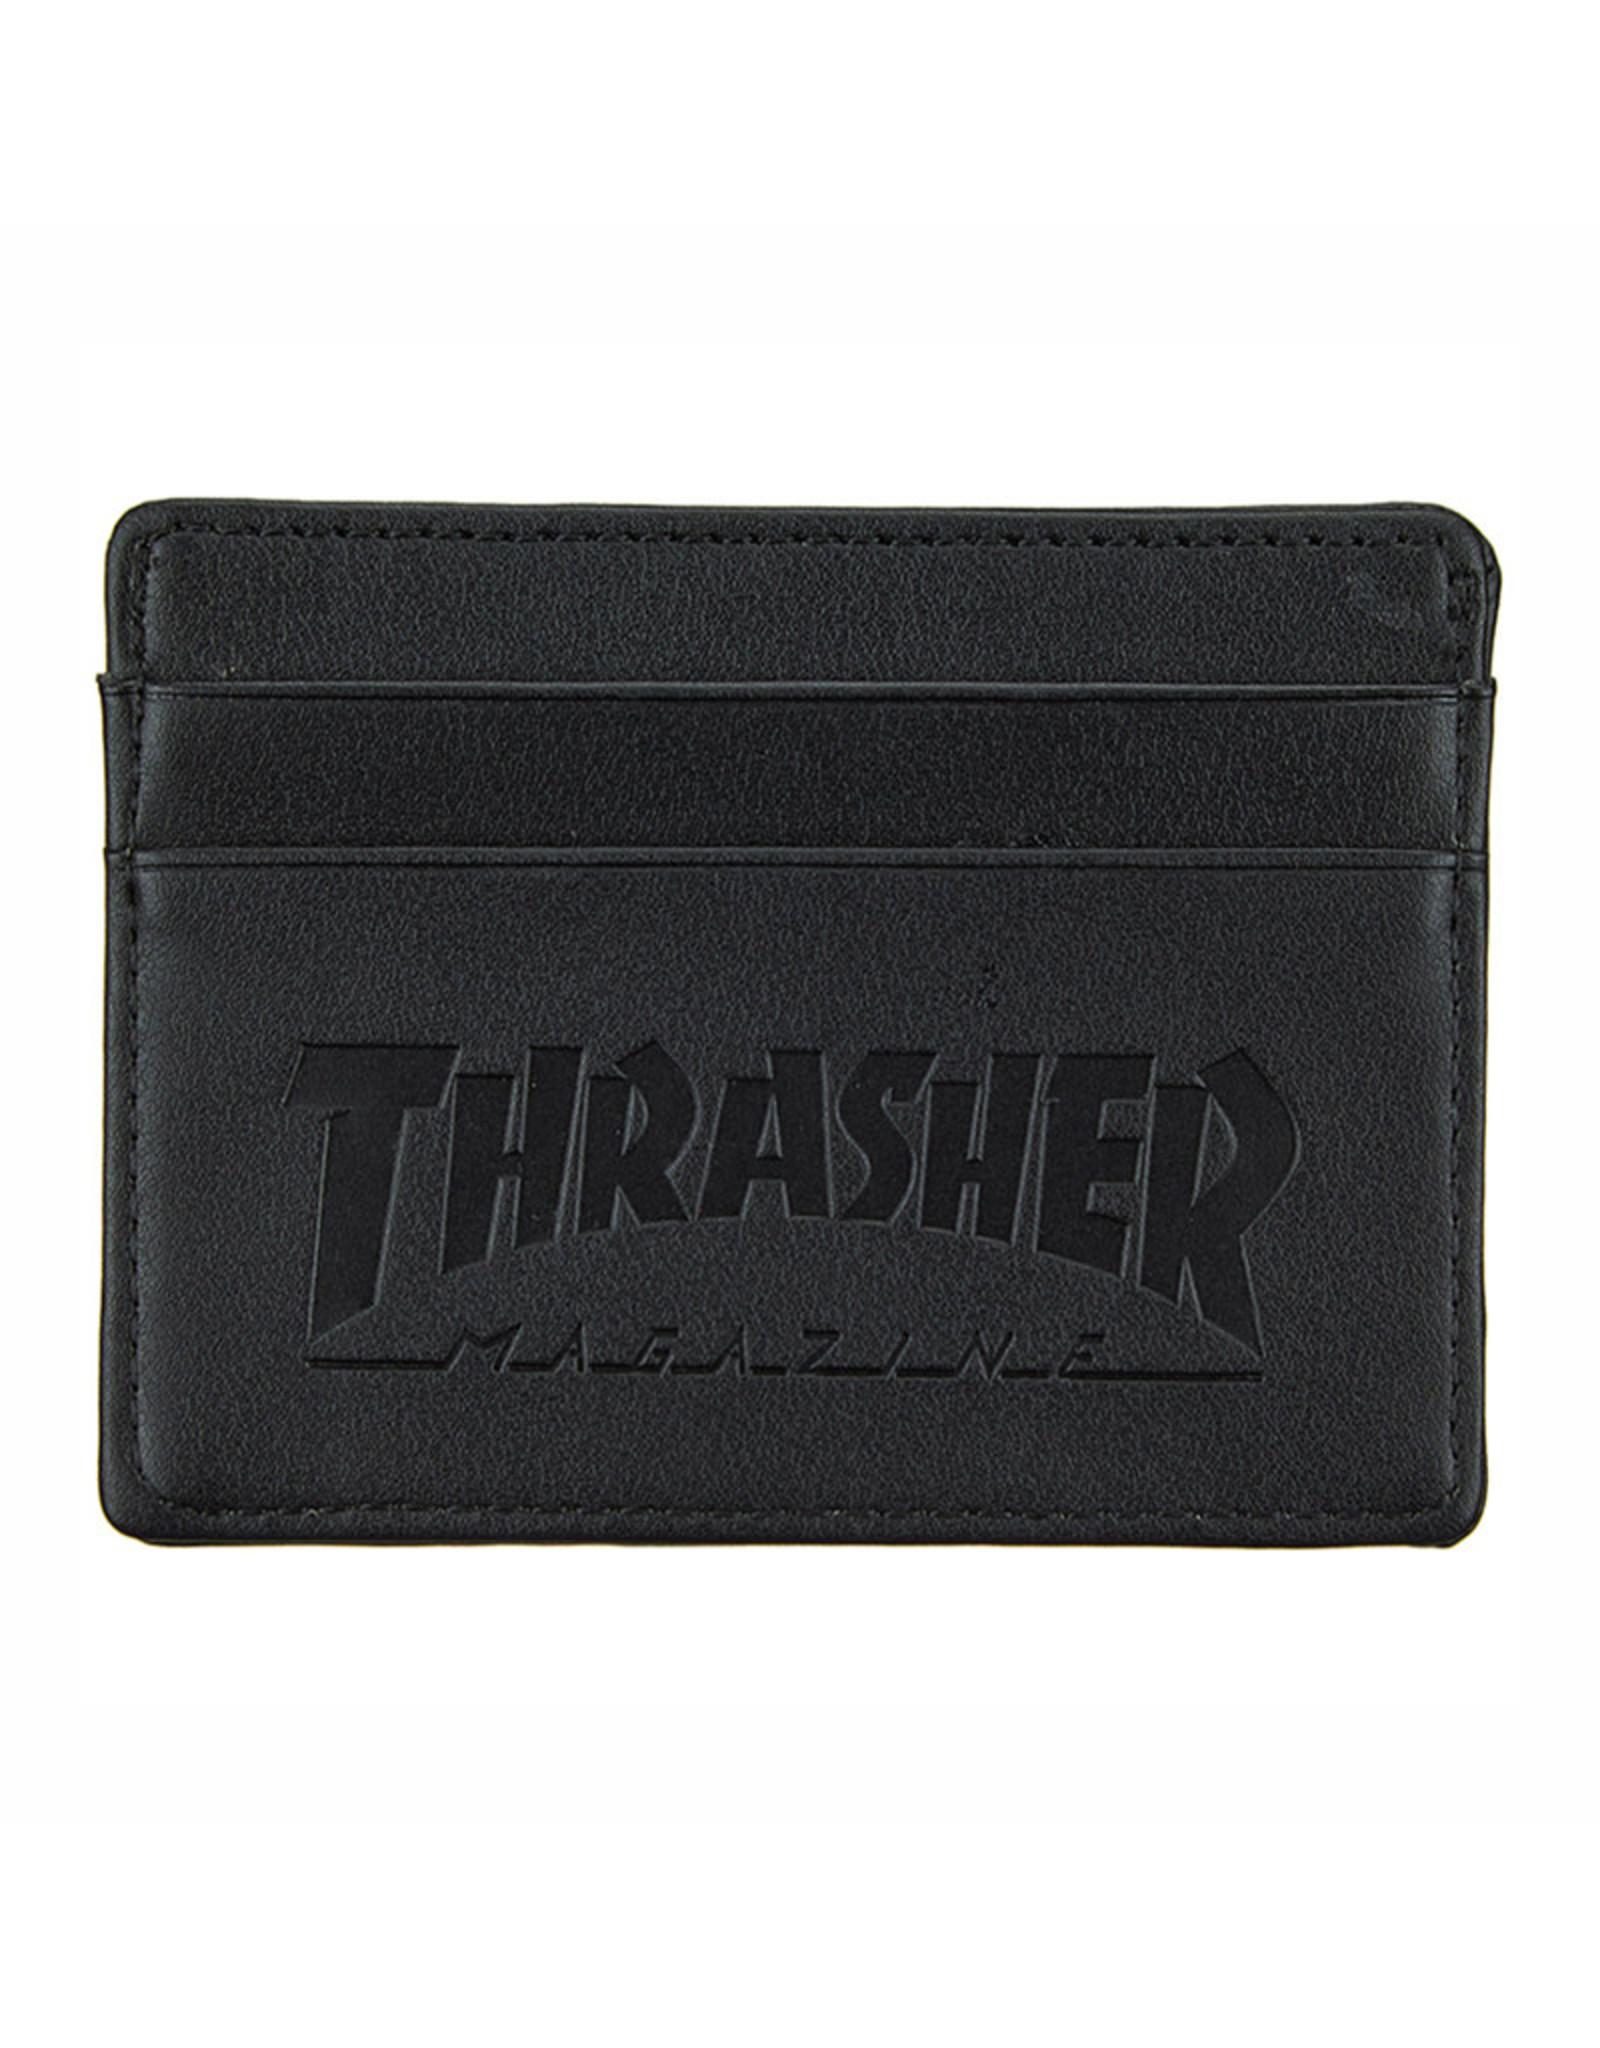 Thrasher Thrasher Wallet Card (Black)